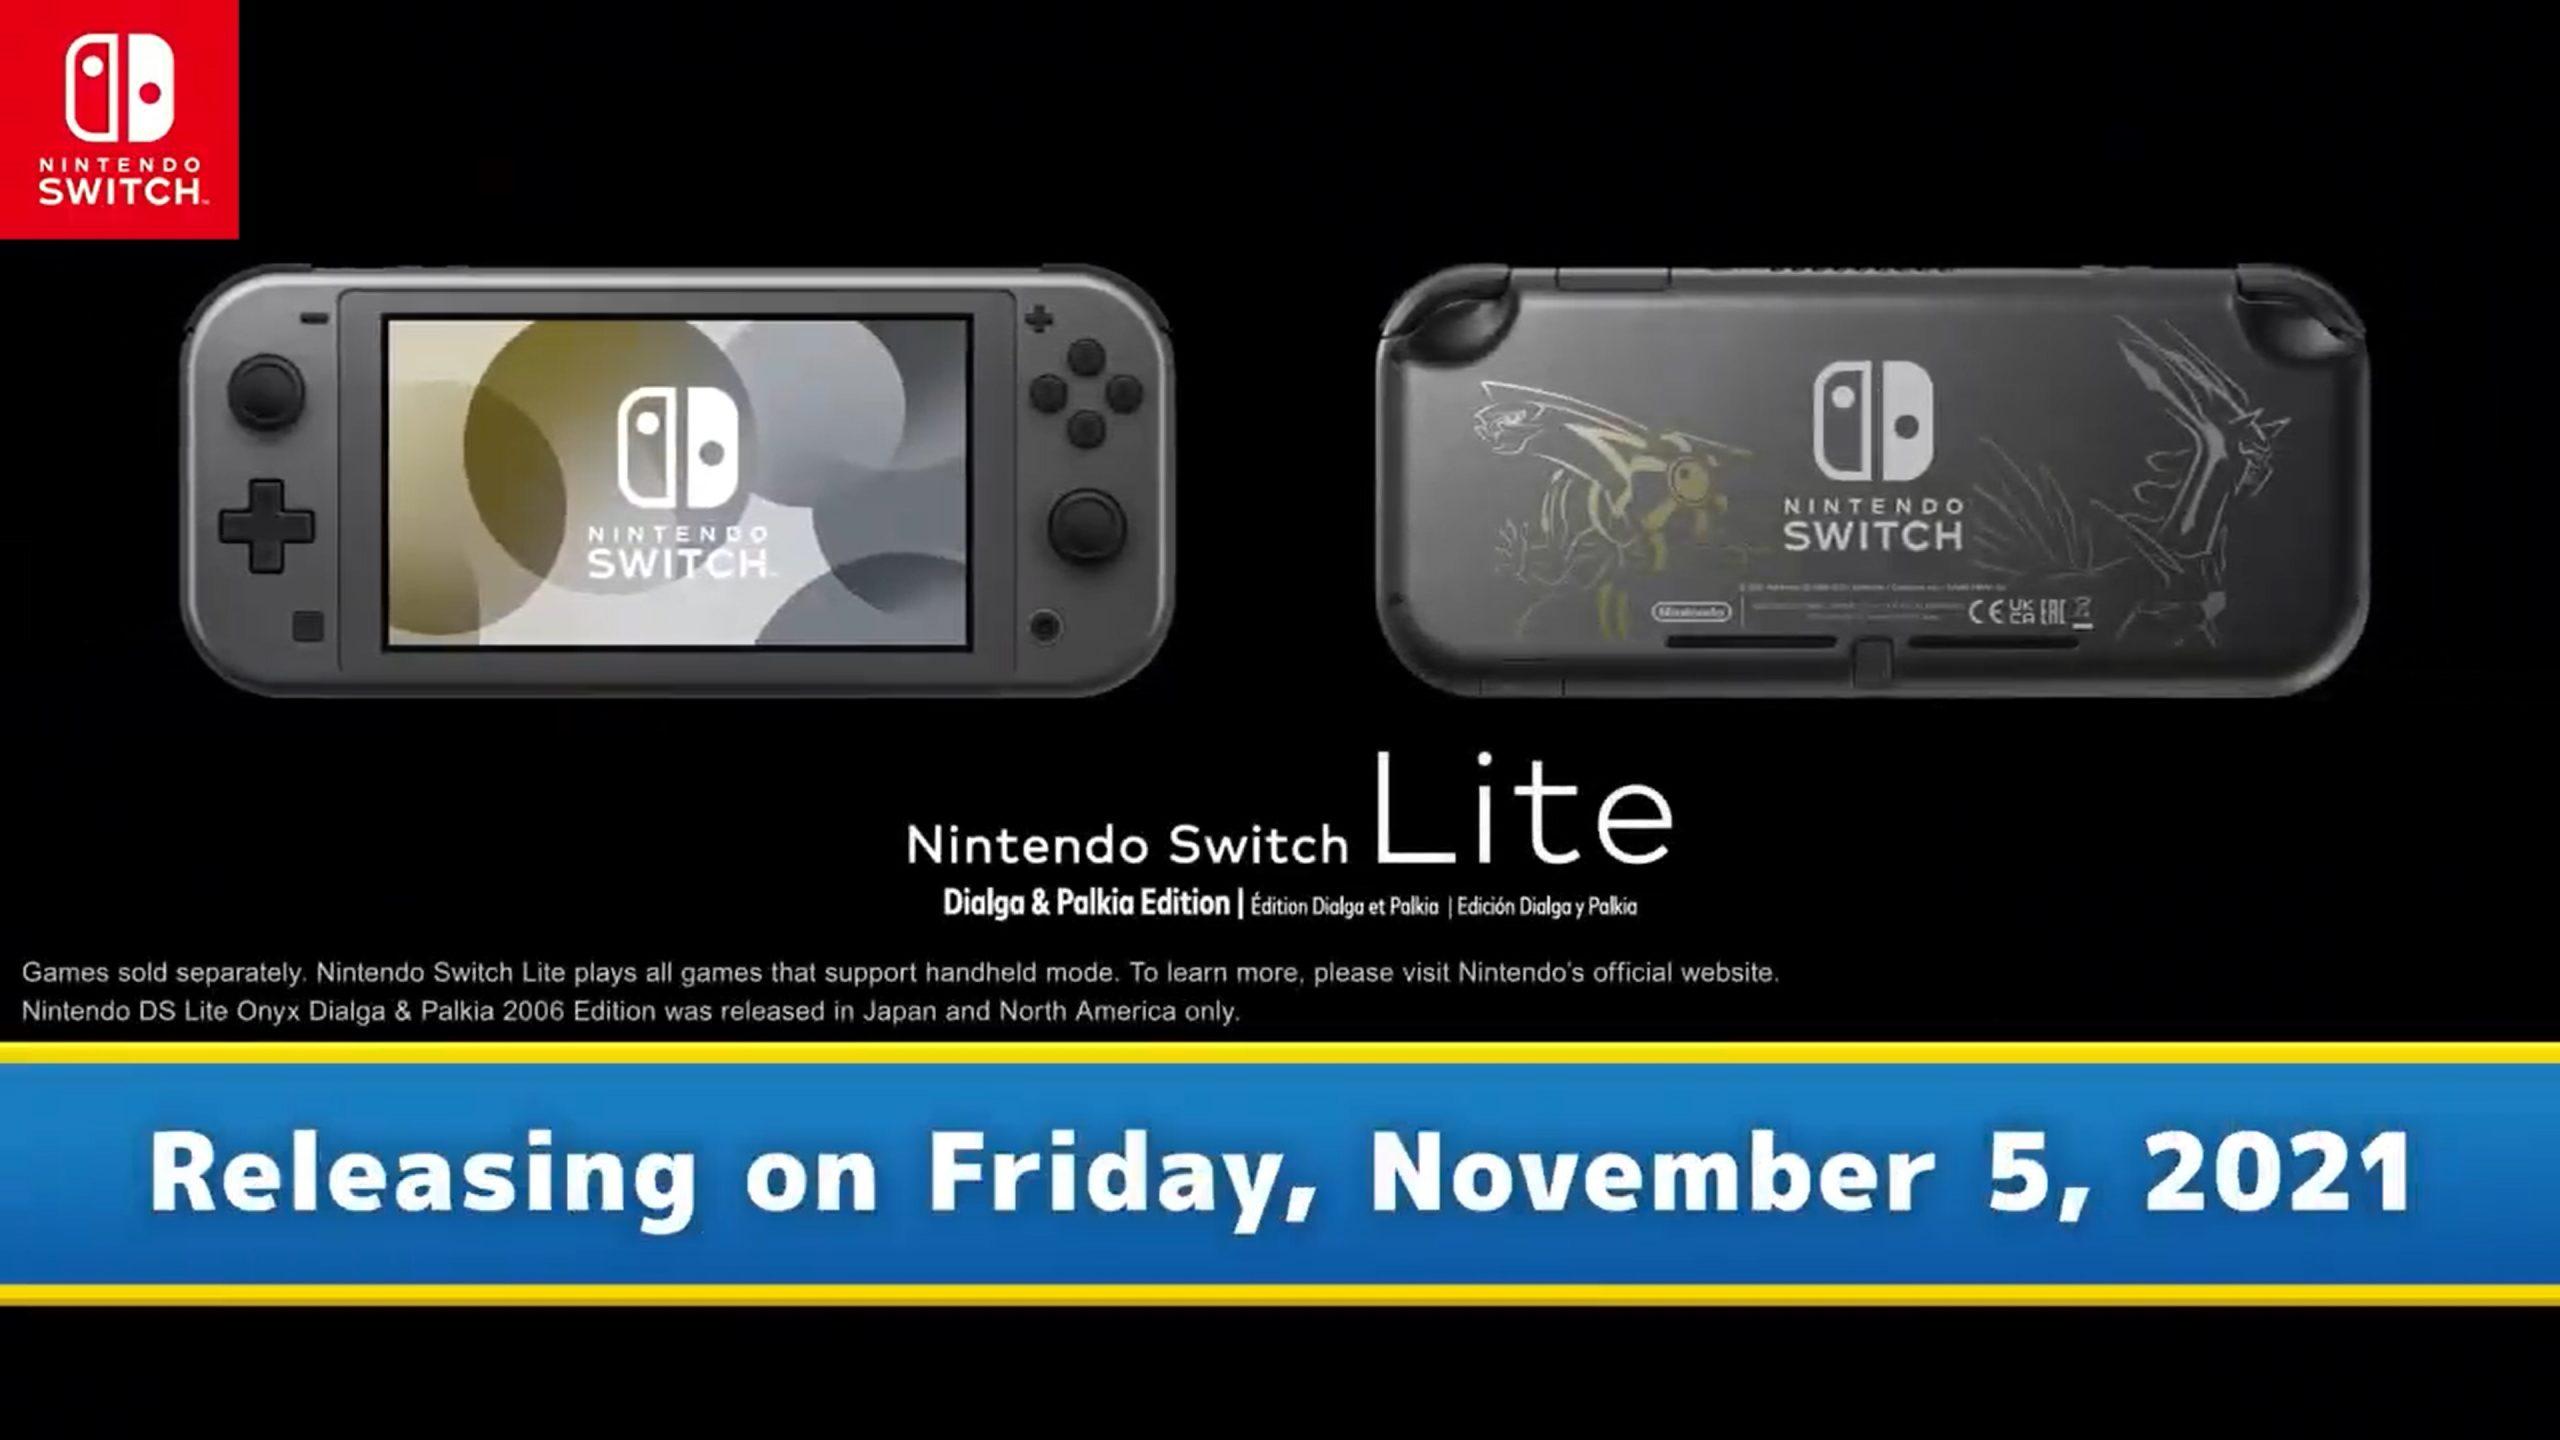 Anuncian un nuevo Nintendo Switch Lite edición Pokémon Dialga & Palkia